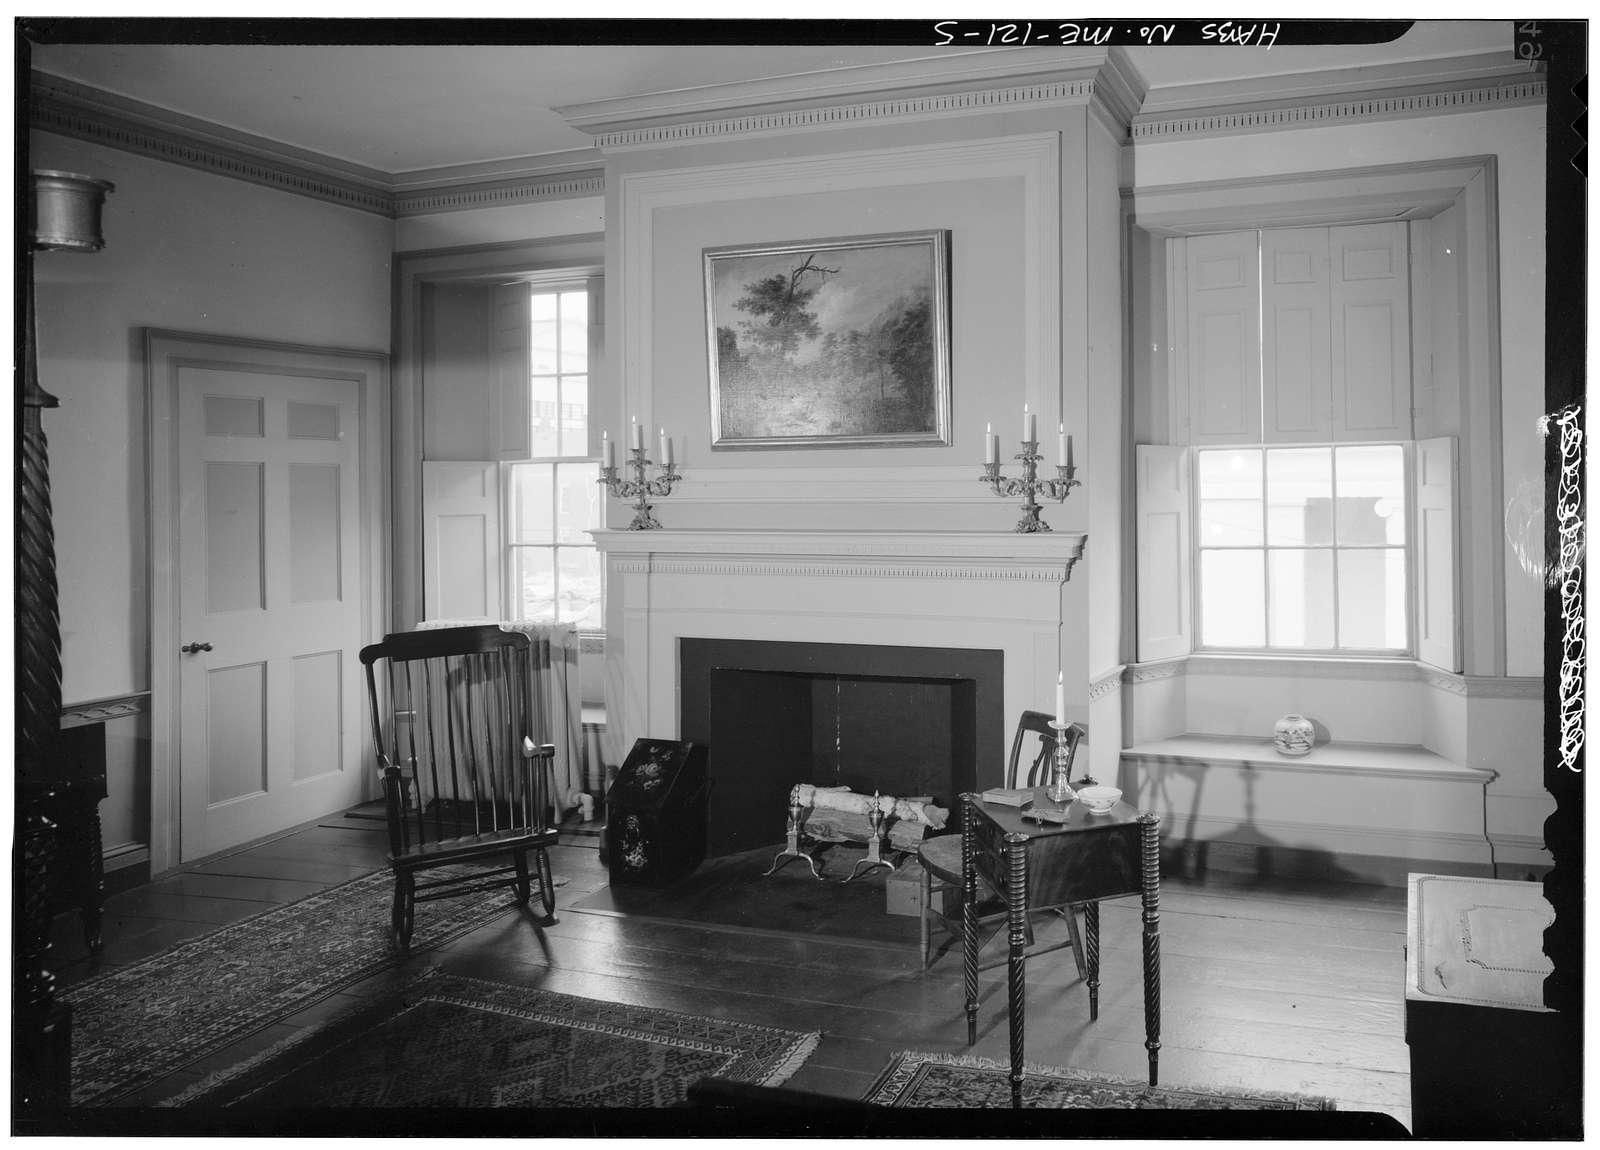 McLellan-Sweat House, 111 High Street, Portland, Cumberland County, ME